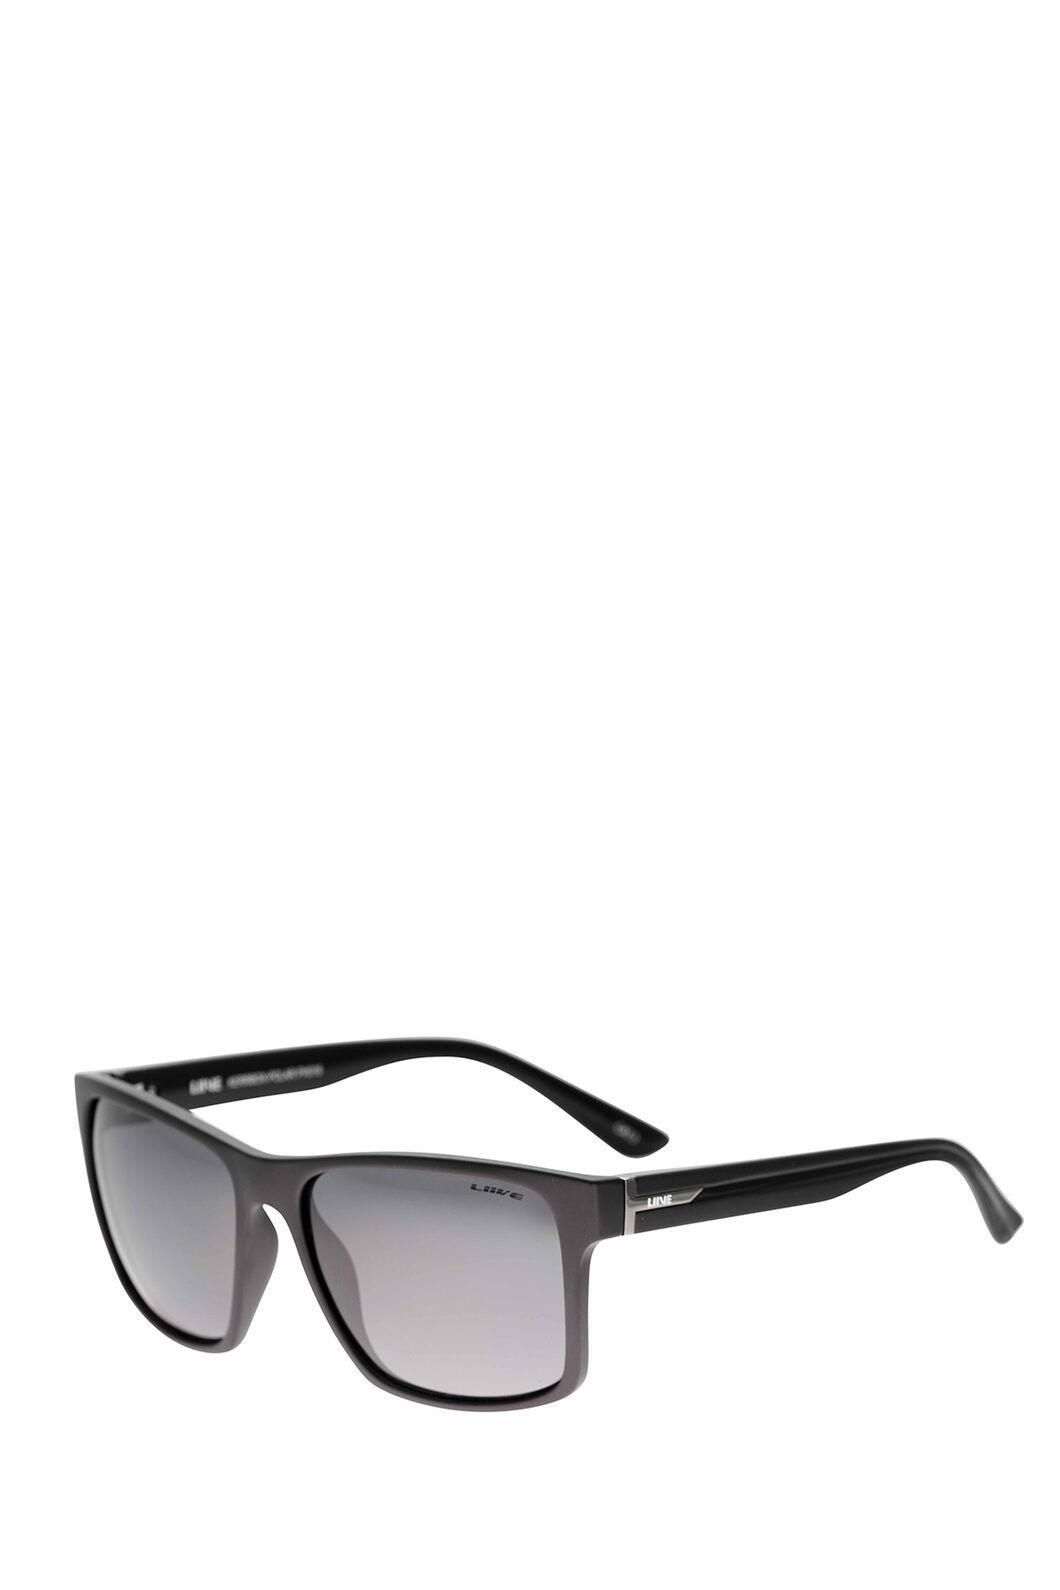 Liive Vision Kerrbox Polarised Sunglasses, Twin Blacks, hi-res